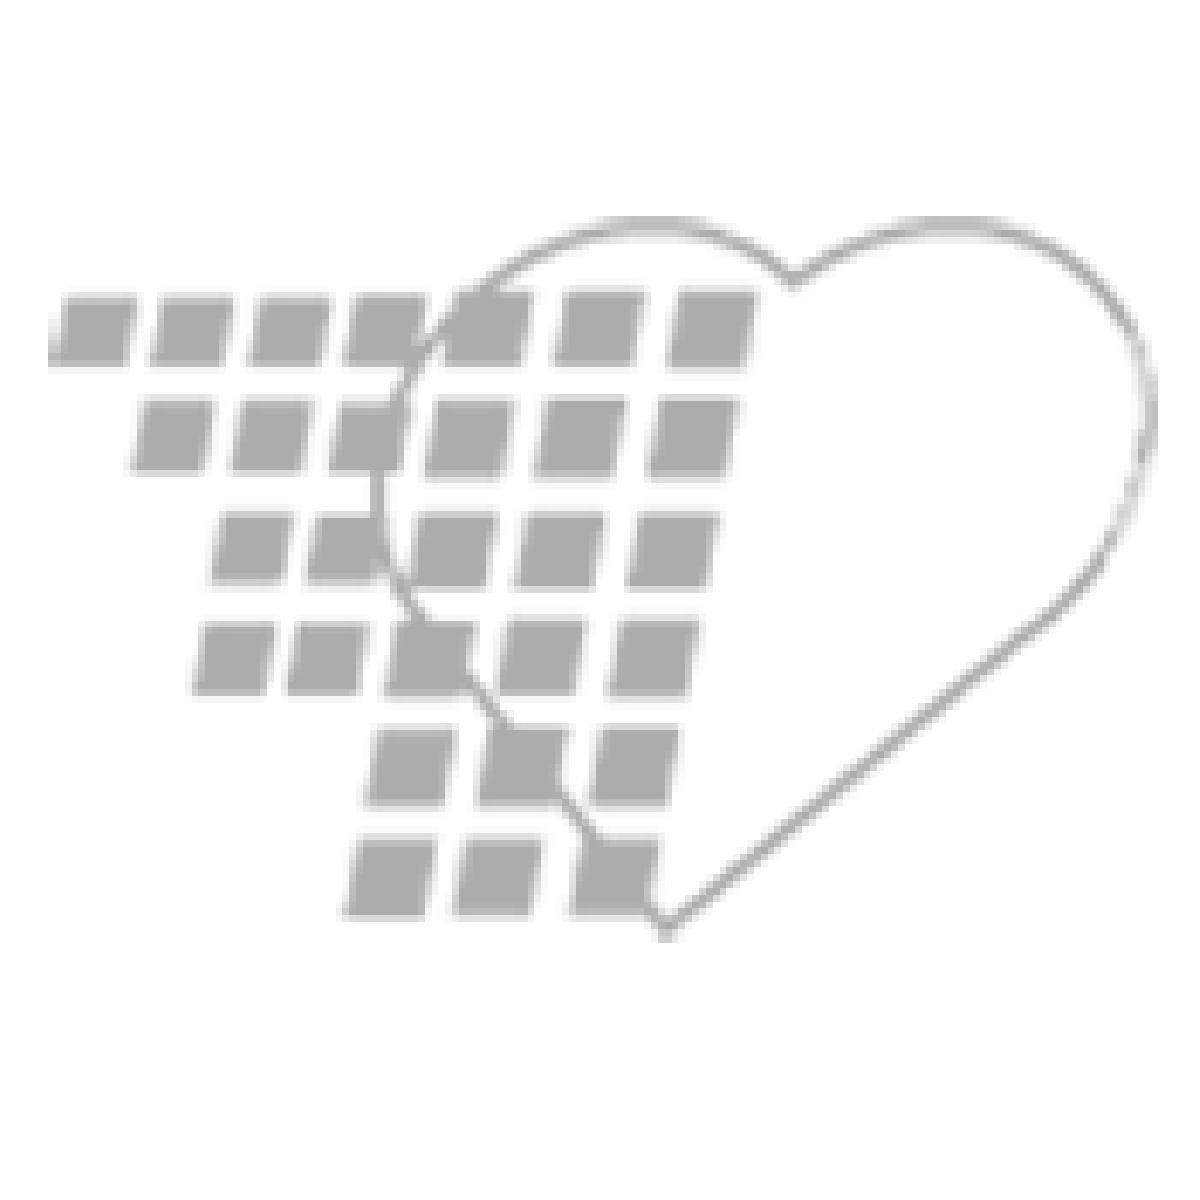 06-93-1100 - Demo Dose® EPINEPHrin Adrenaln 10ml syringe